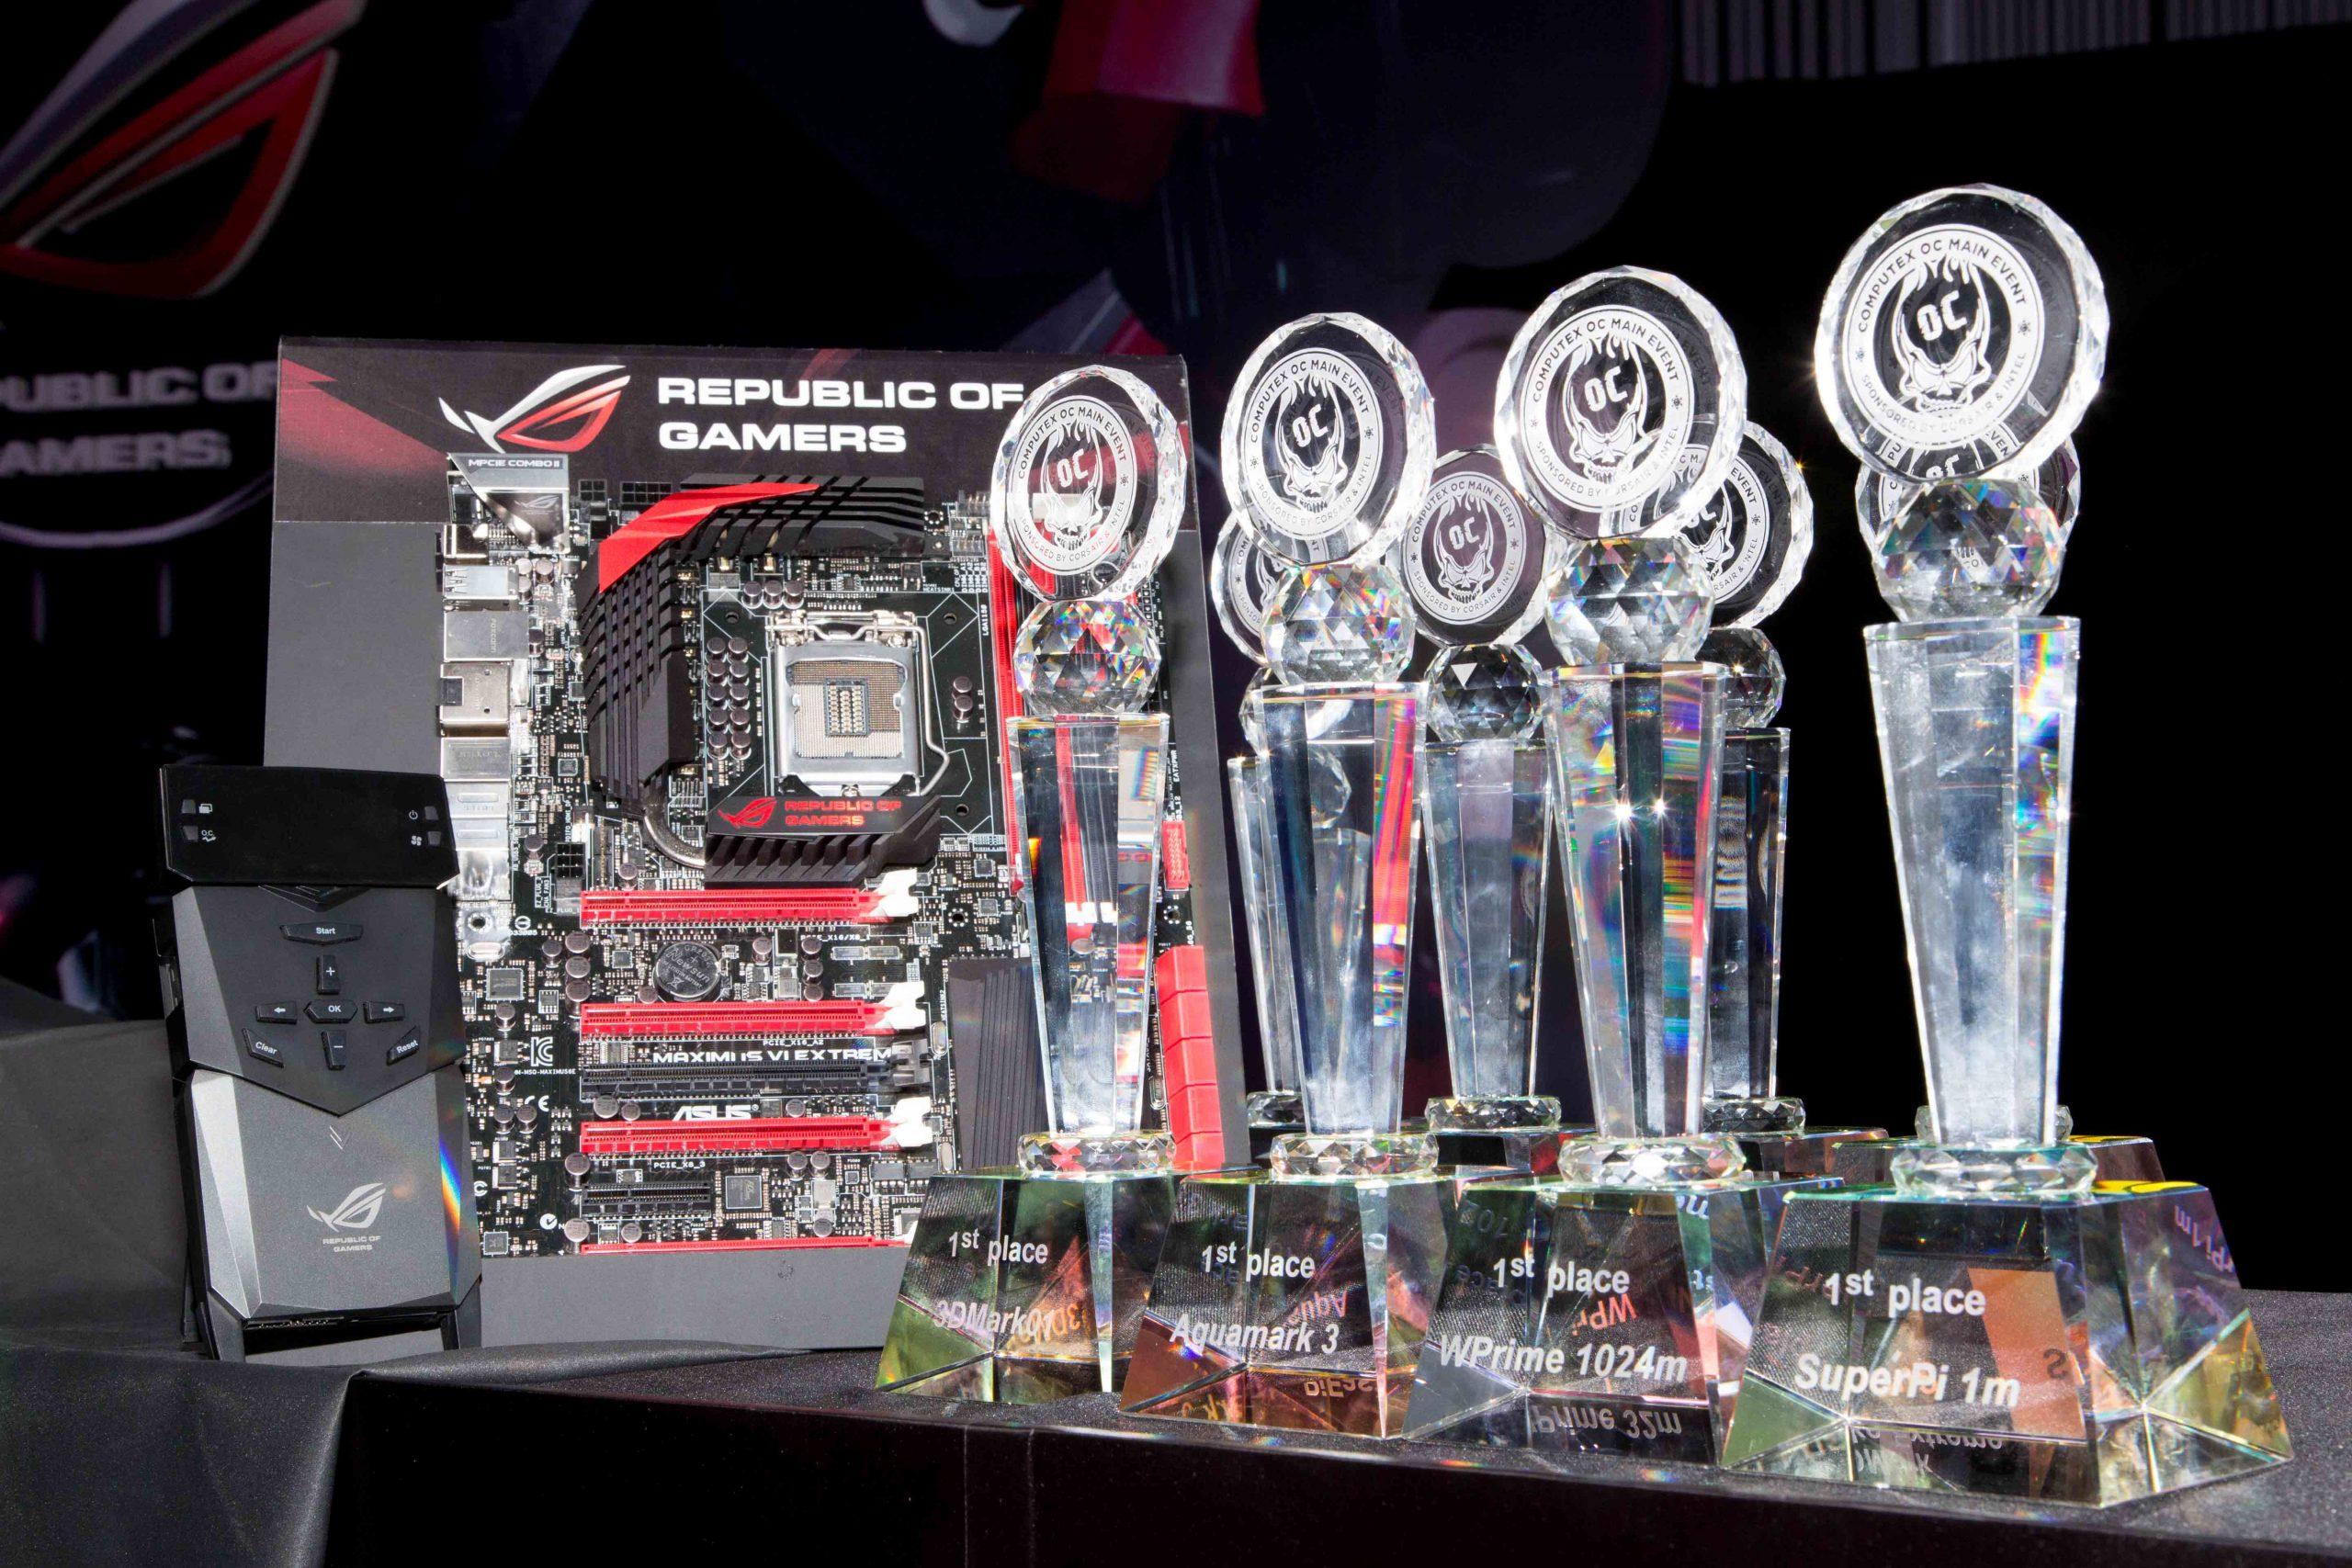 ASUS ROG Maximus VI Extreme Dominates Computex Overclocking Event, Used to Break Eight World Records